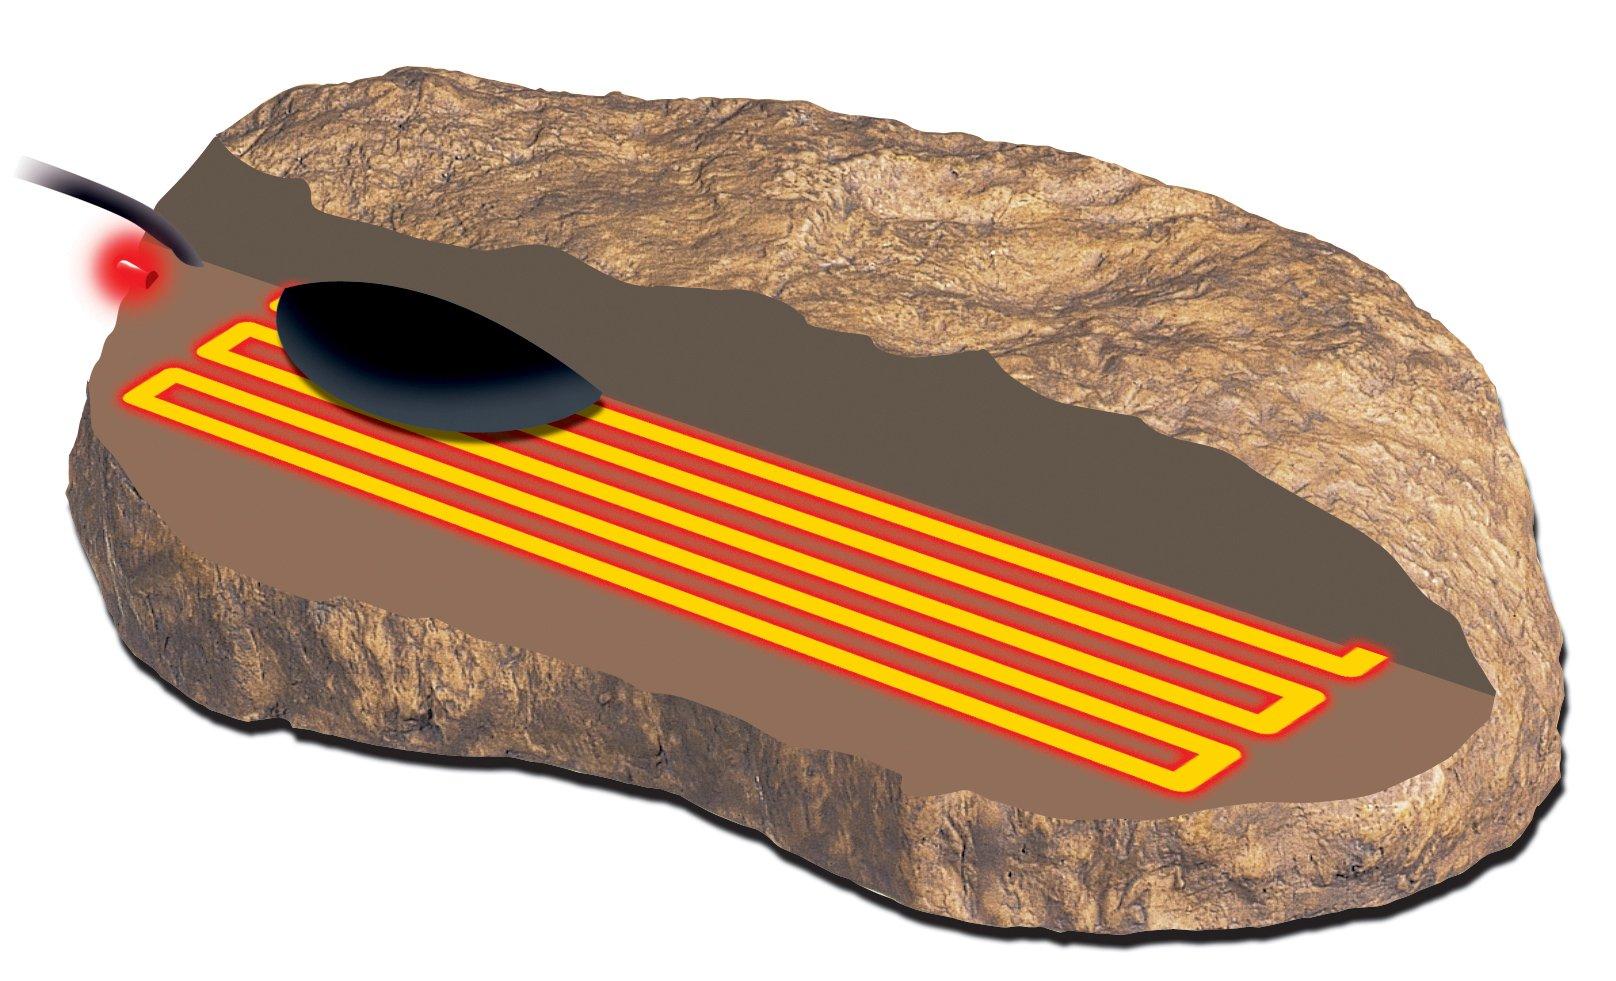 Exo Terra Heatwave Rock, Ul Listed, Small by Exo Terra (Image #1)